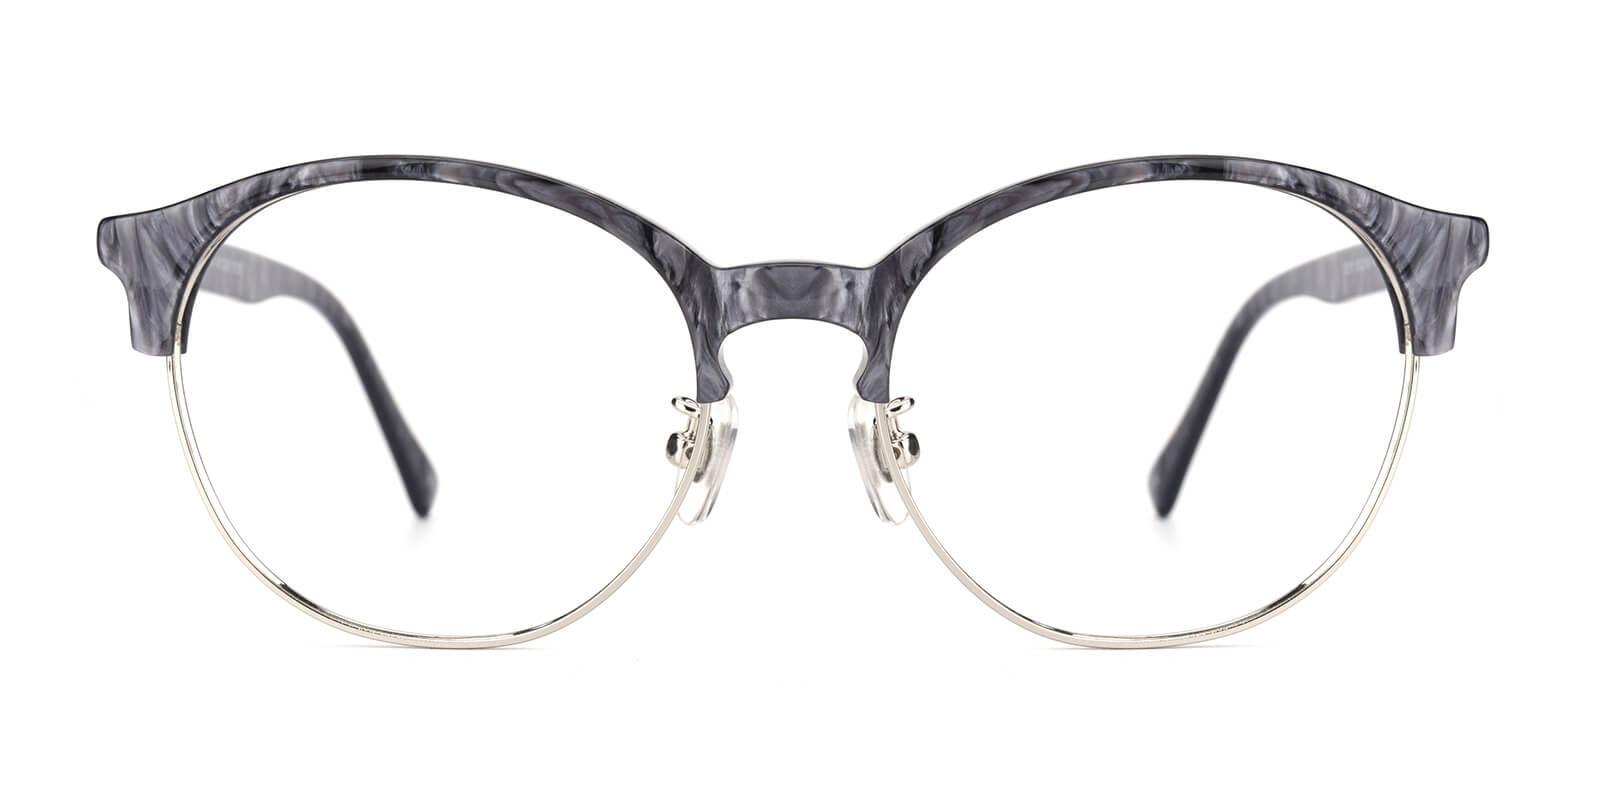 Mandisey-Gray-Browline-Combination-Eyeglasses-additional2